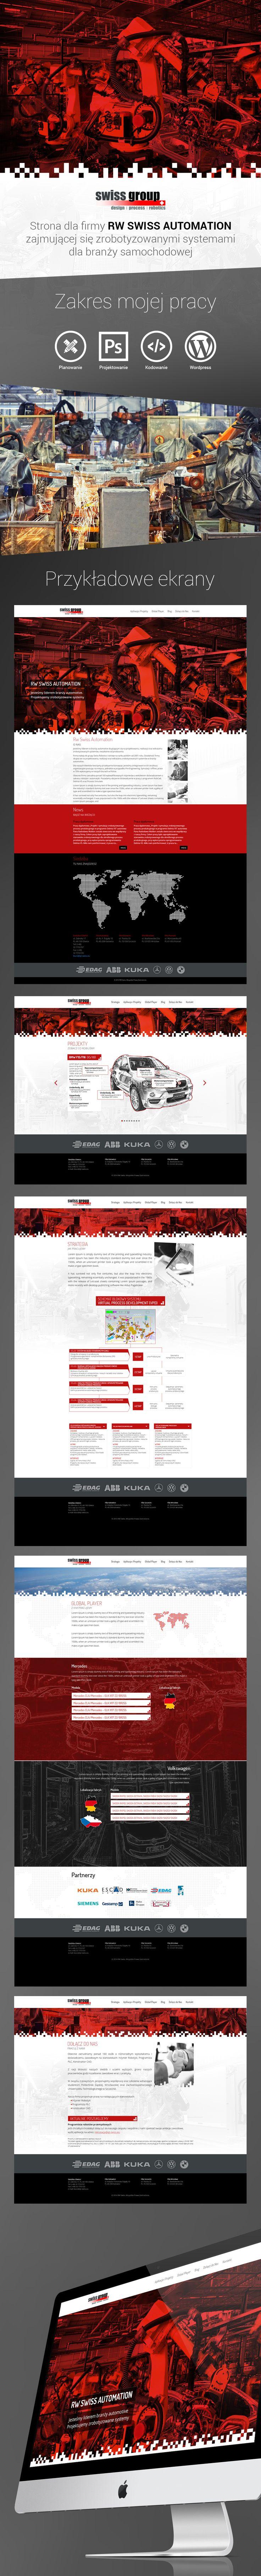 RW Swiss | Webdesign | Web | Design | html/css/js | Wordpress | Web Graphics